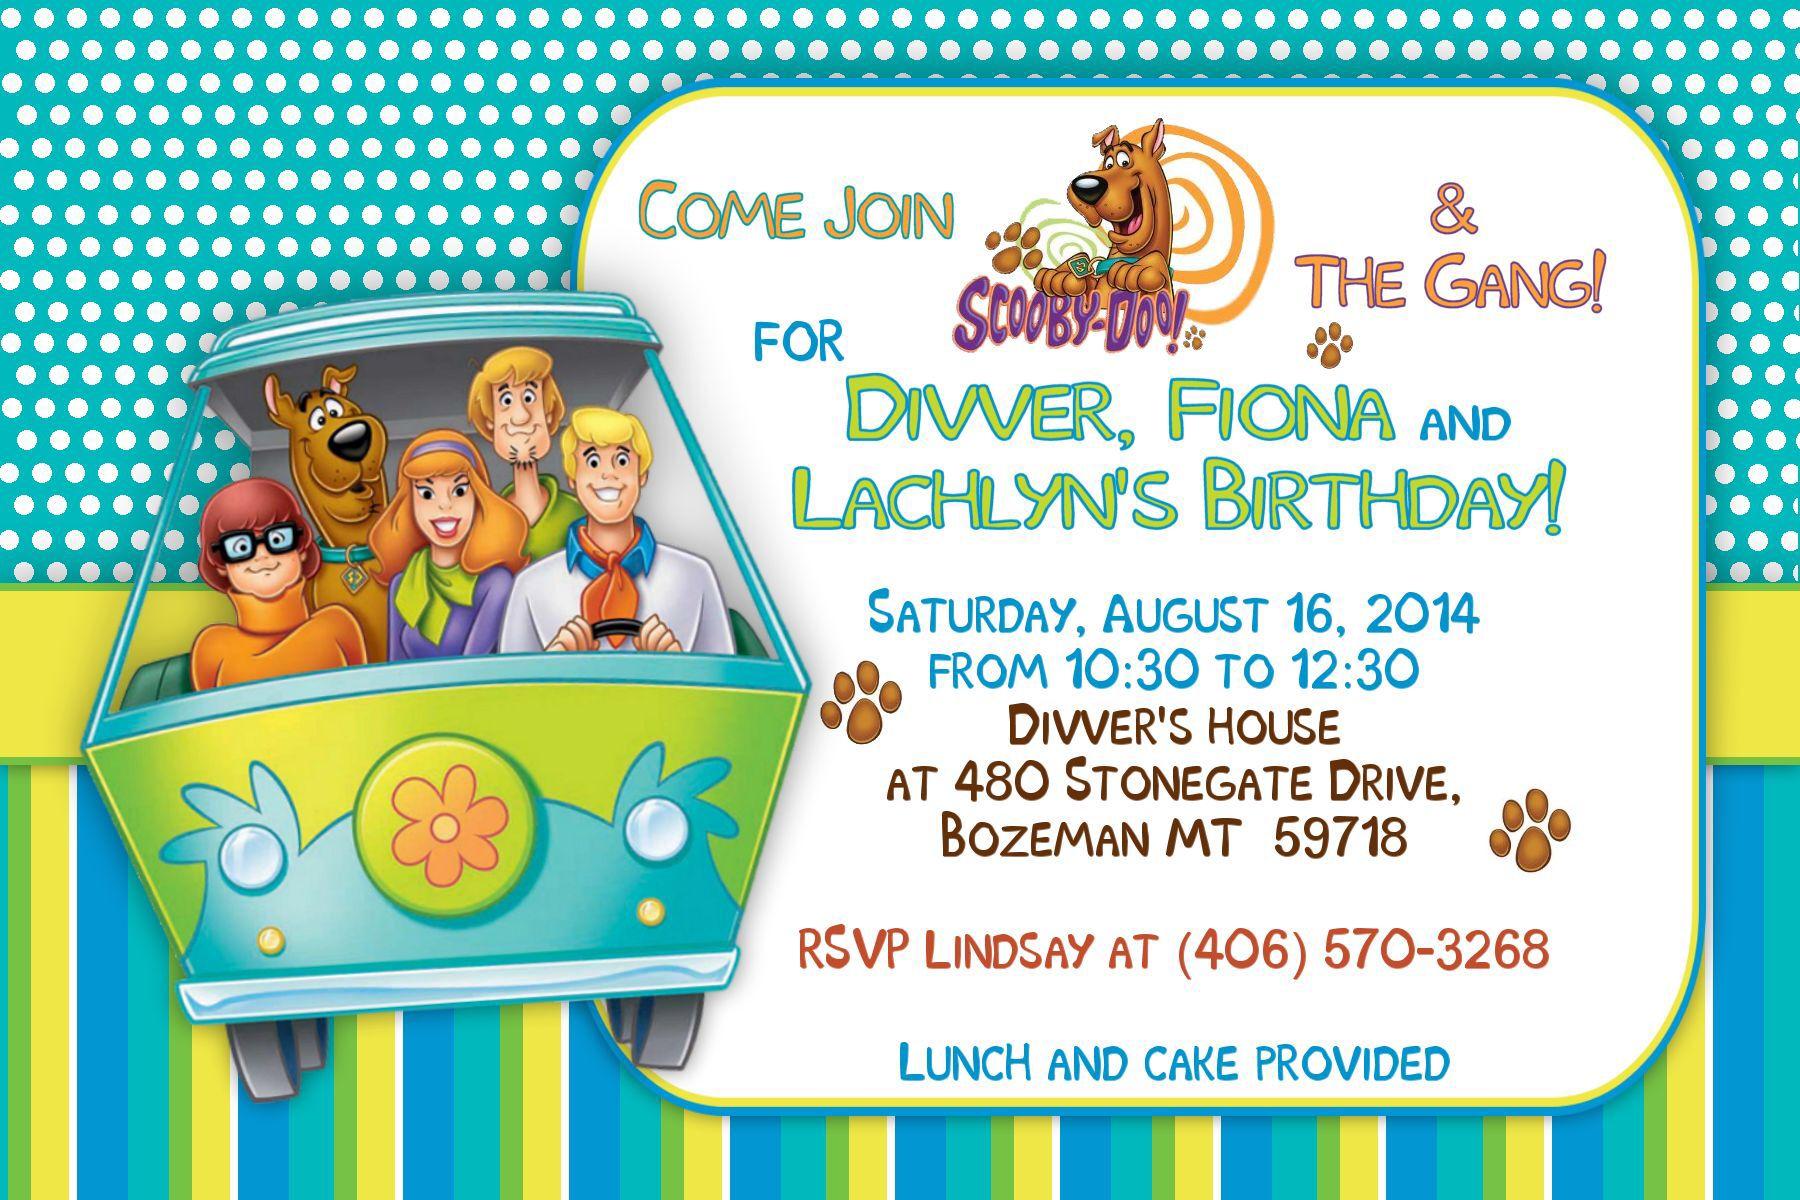 Scooby Doo invitation | cumpleaños | Pinterest | Scooby doo ...